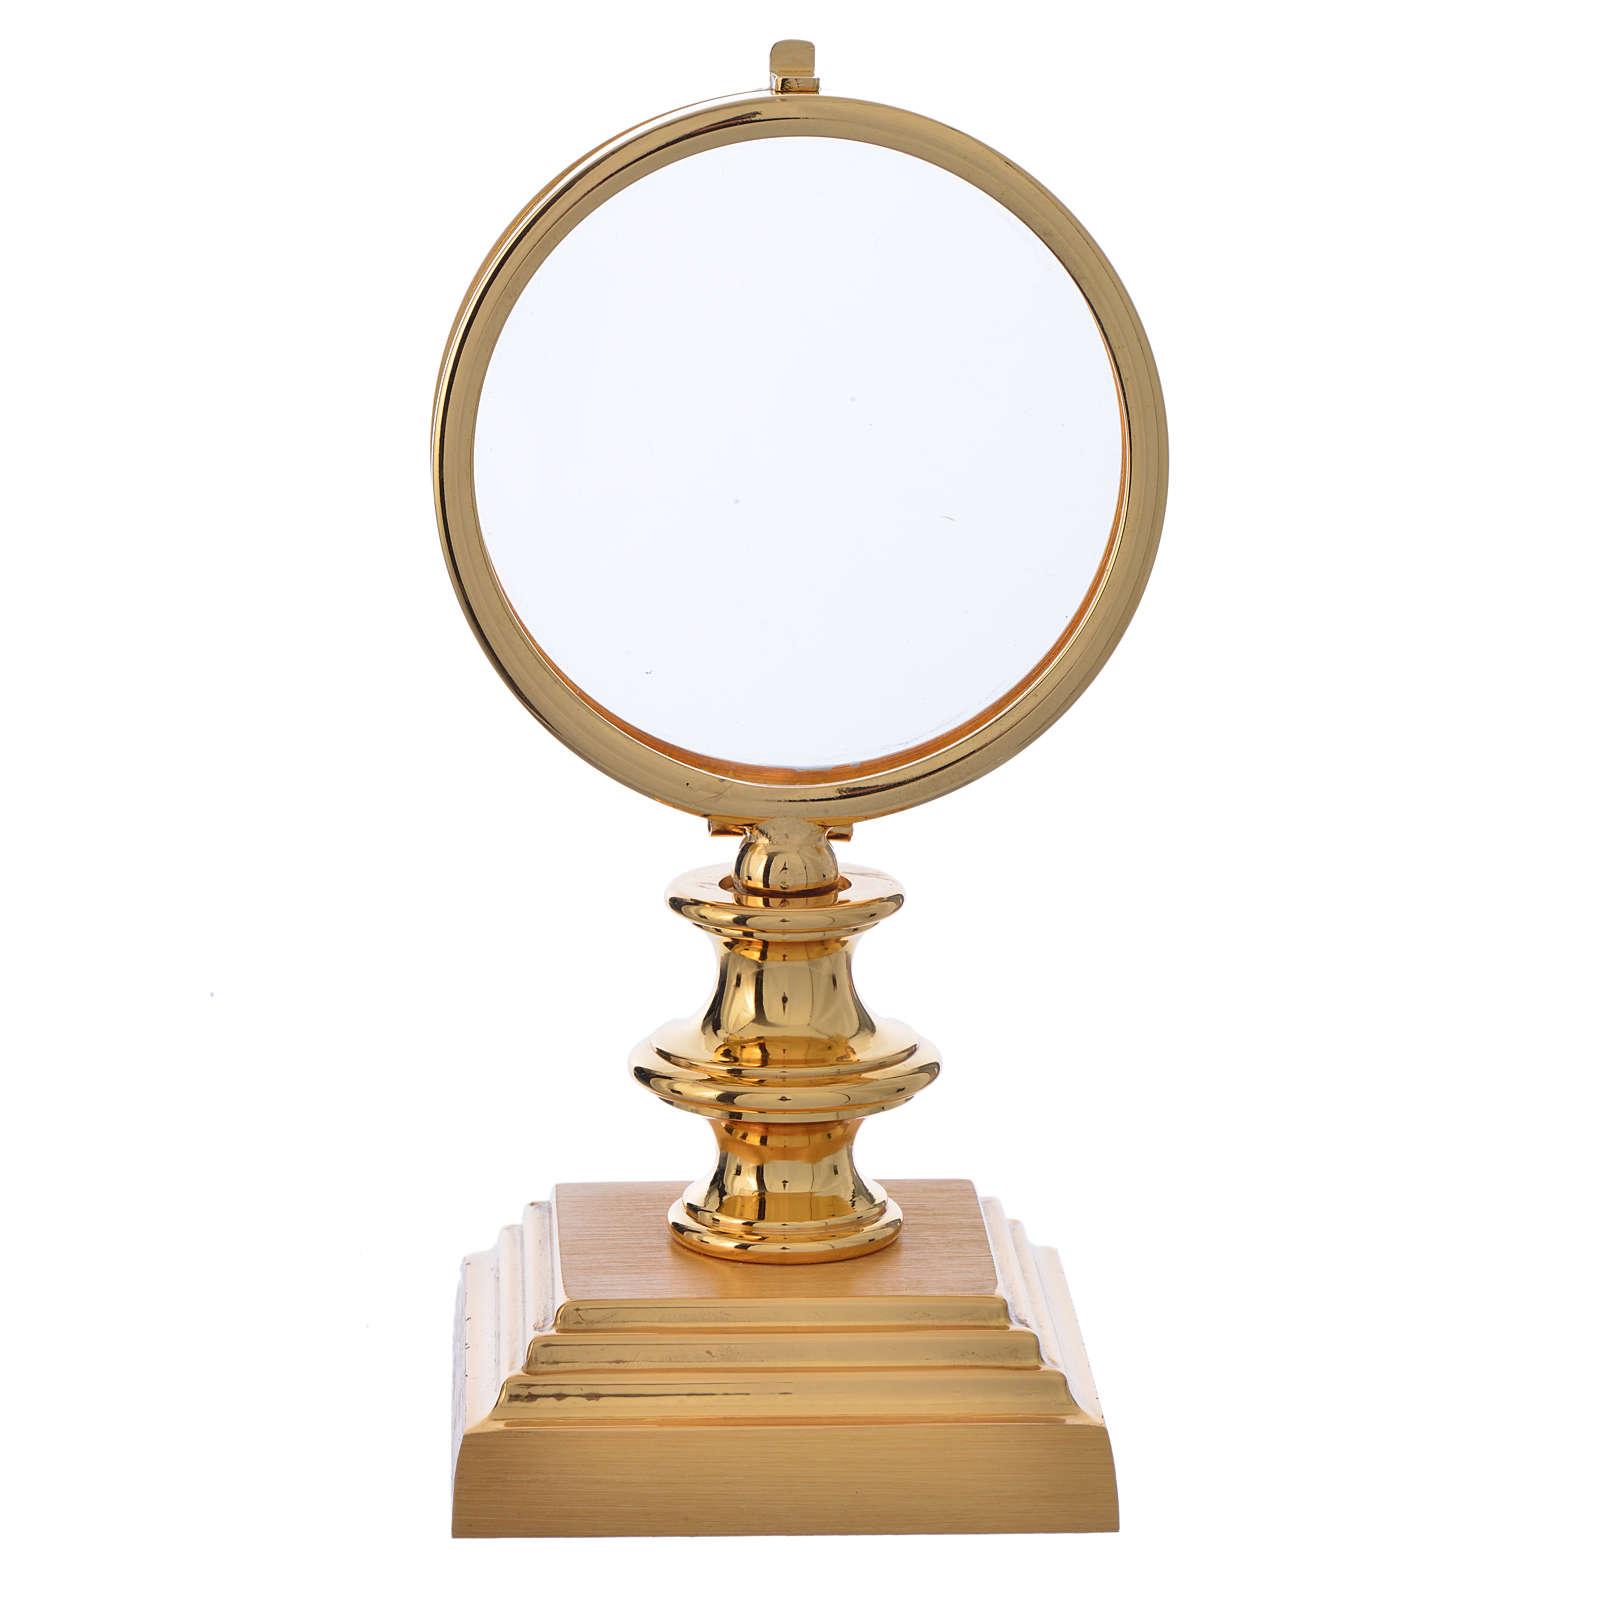 Chapel Monstrance 7,5cm in gold-plated brass H 15cm 4